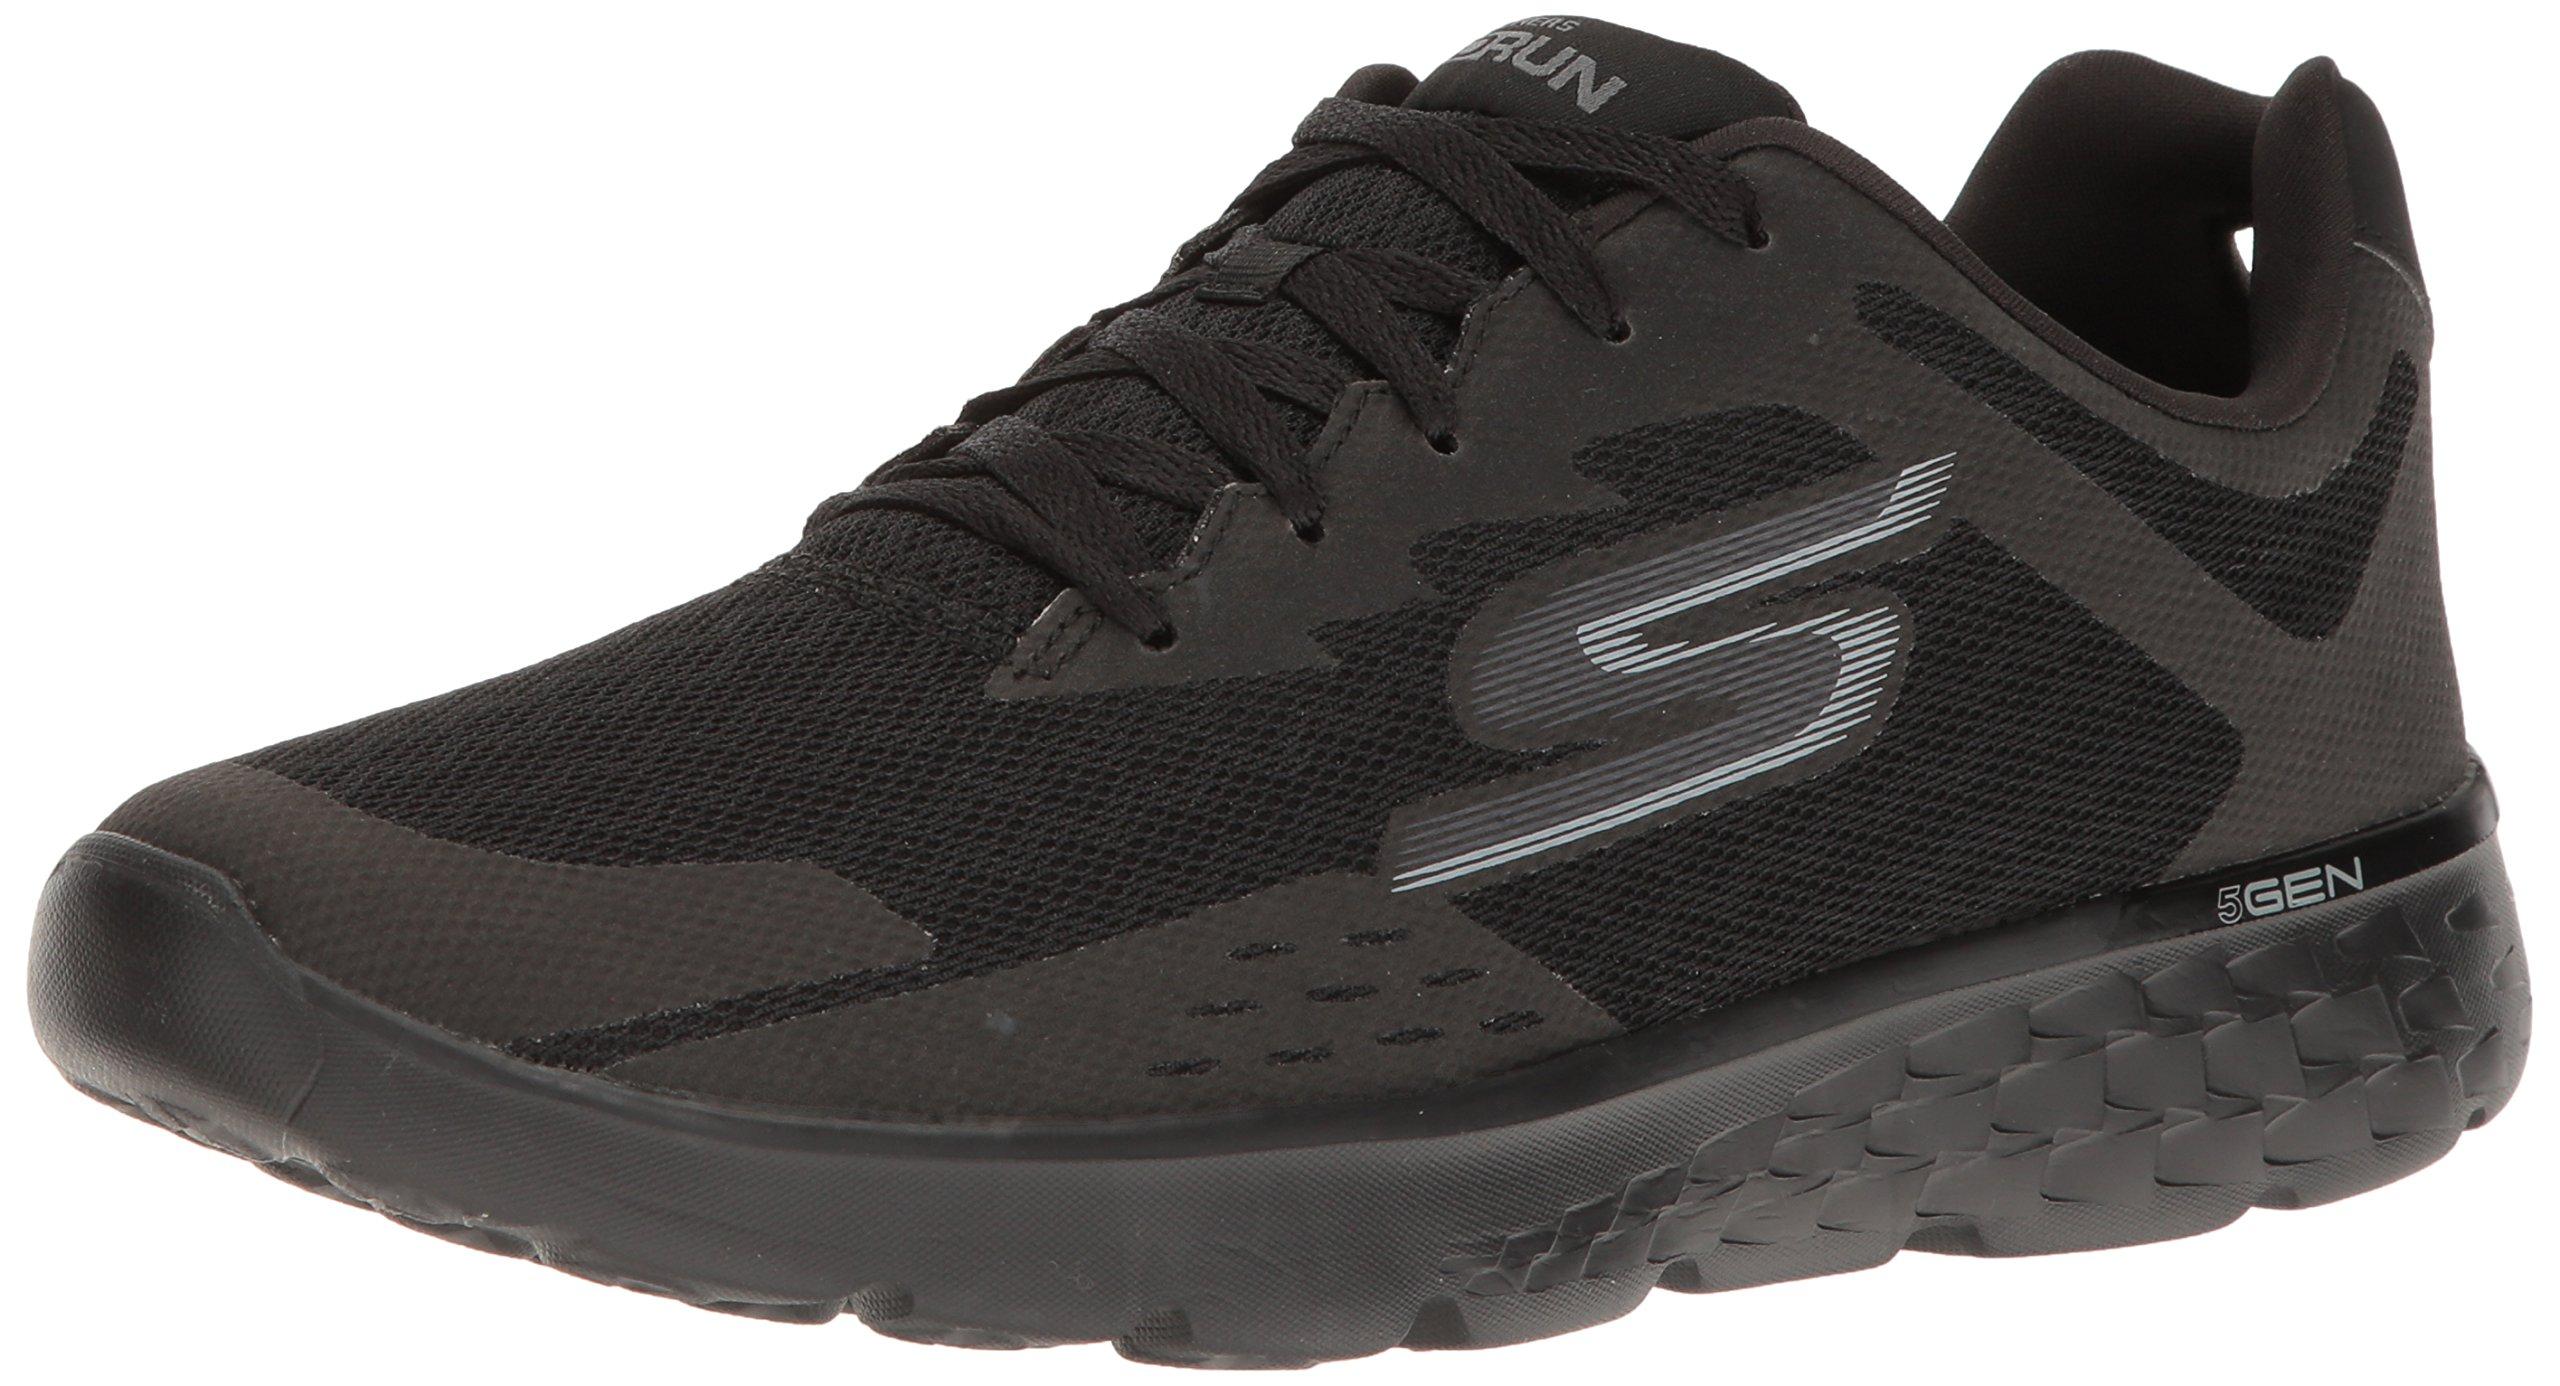 c9b2cc17c4d5b Galleon - Skechers Performance Men's Go Run 400 Disperse Running Shoe,Black  Knit/Gray,9 M US